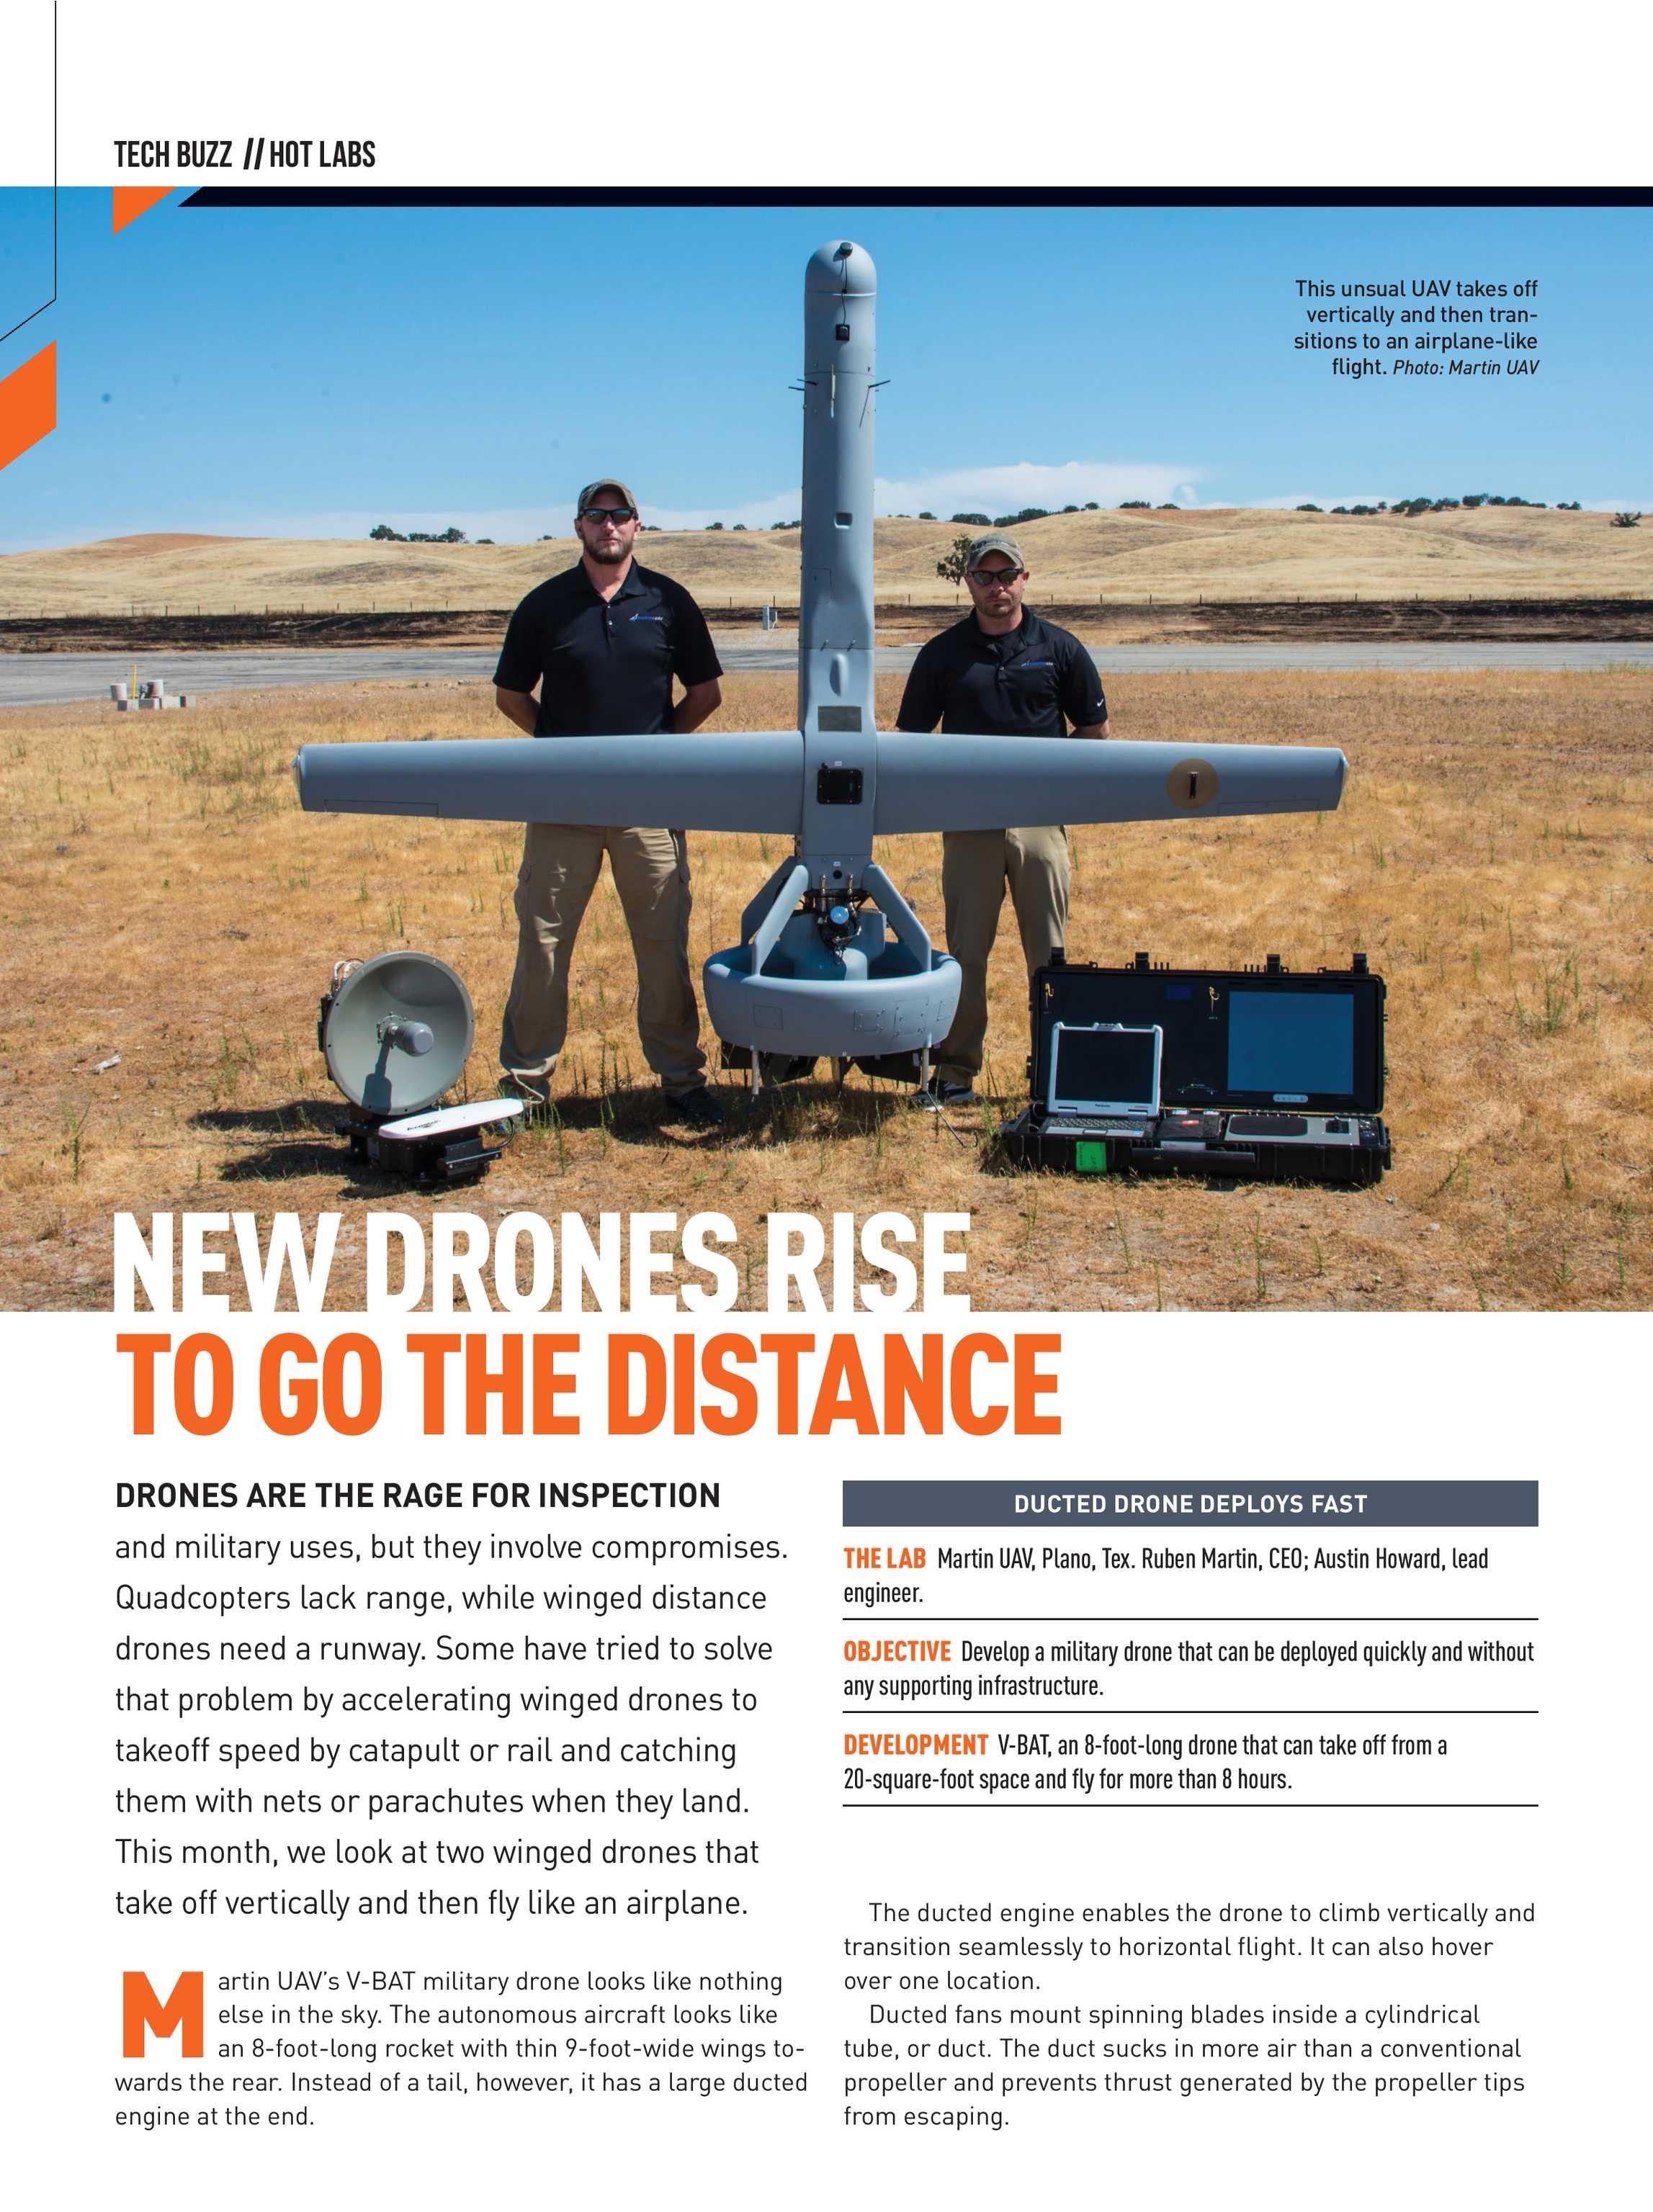 Mechanical Engineering Magazine - January 2019 - page 20